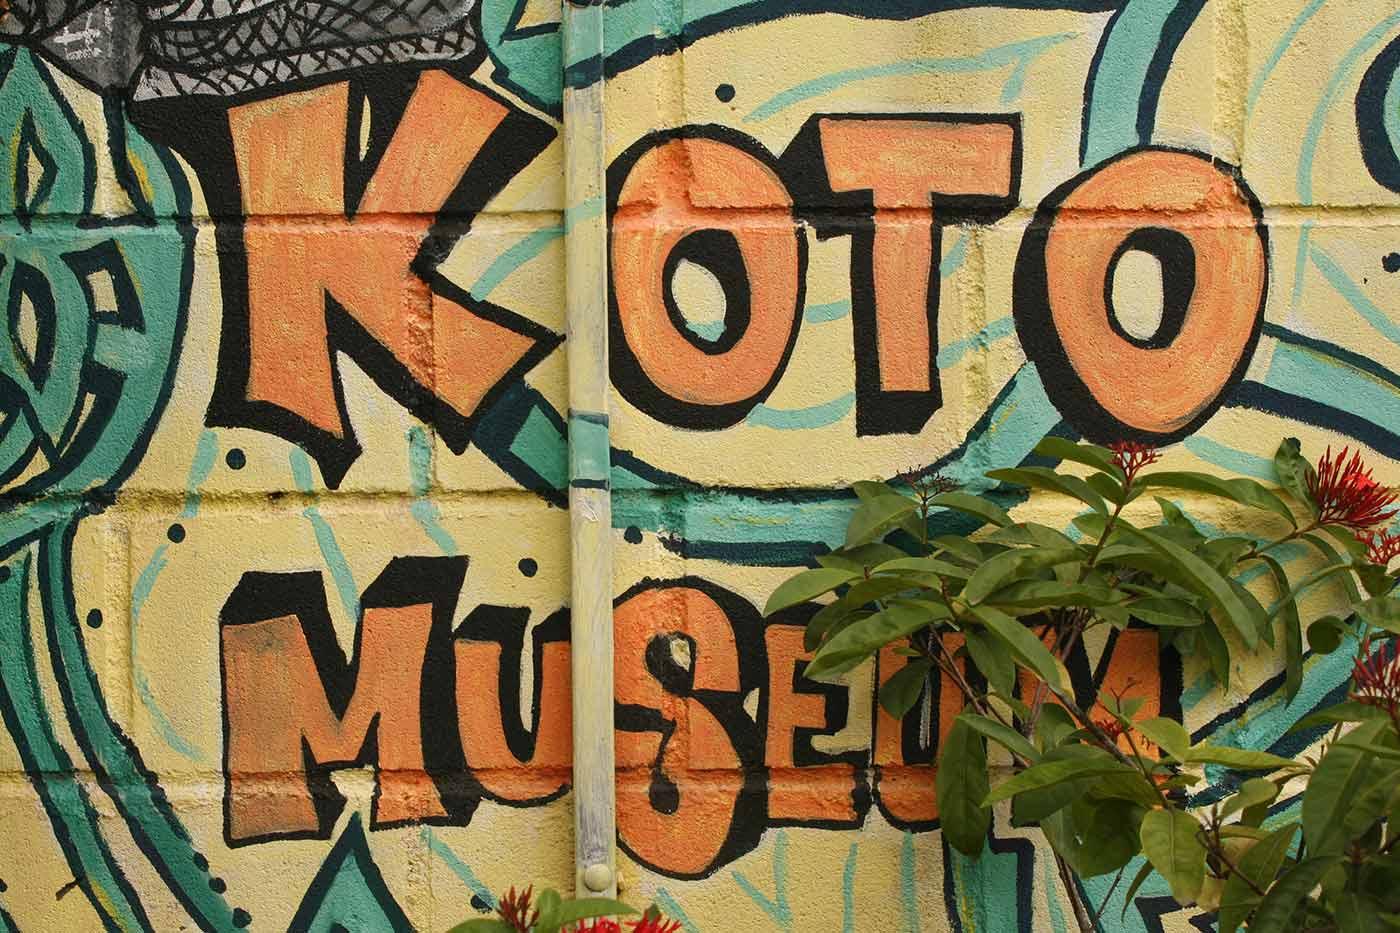 Koto Museum graffiti